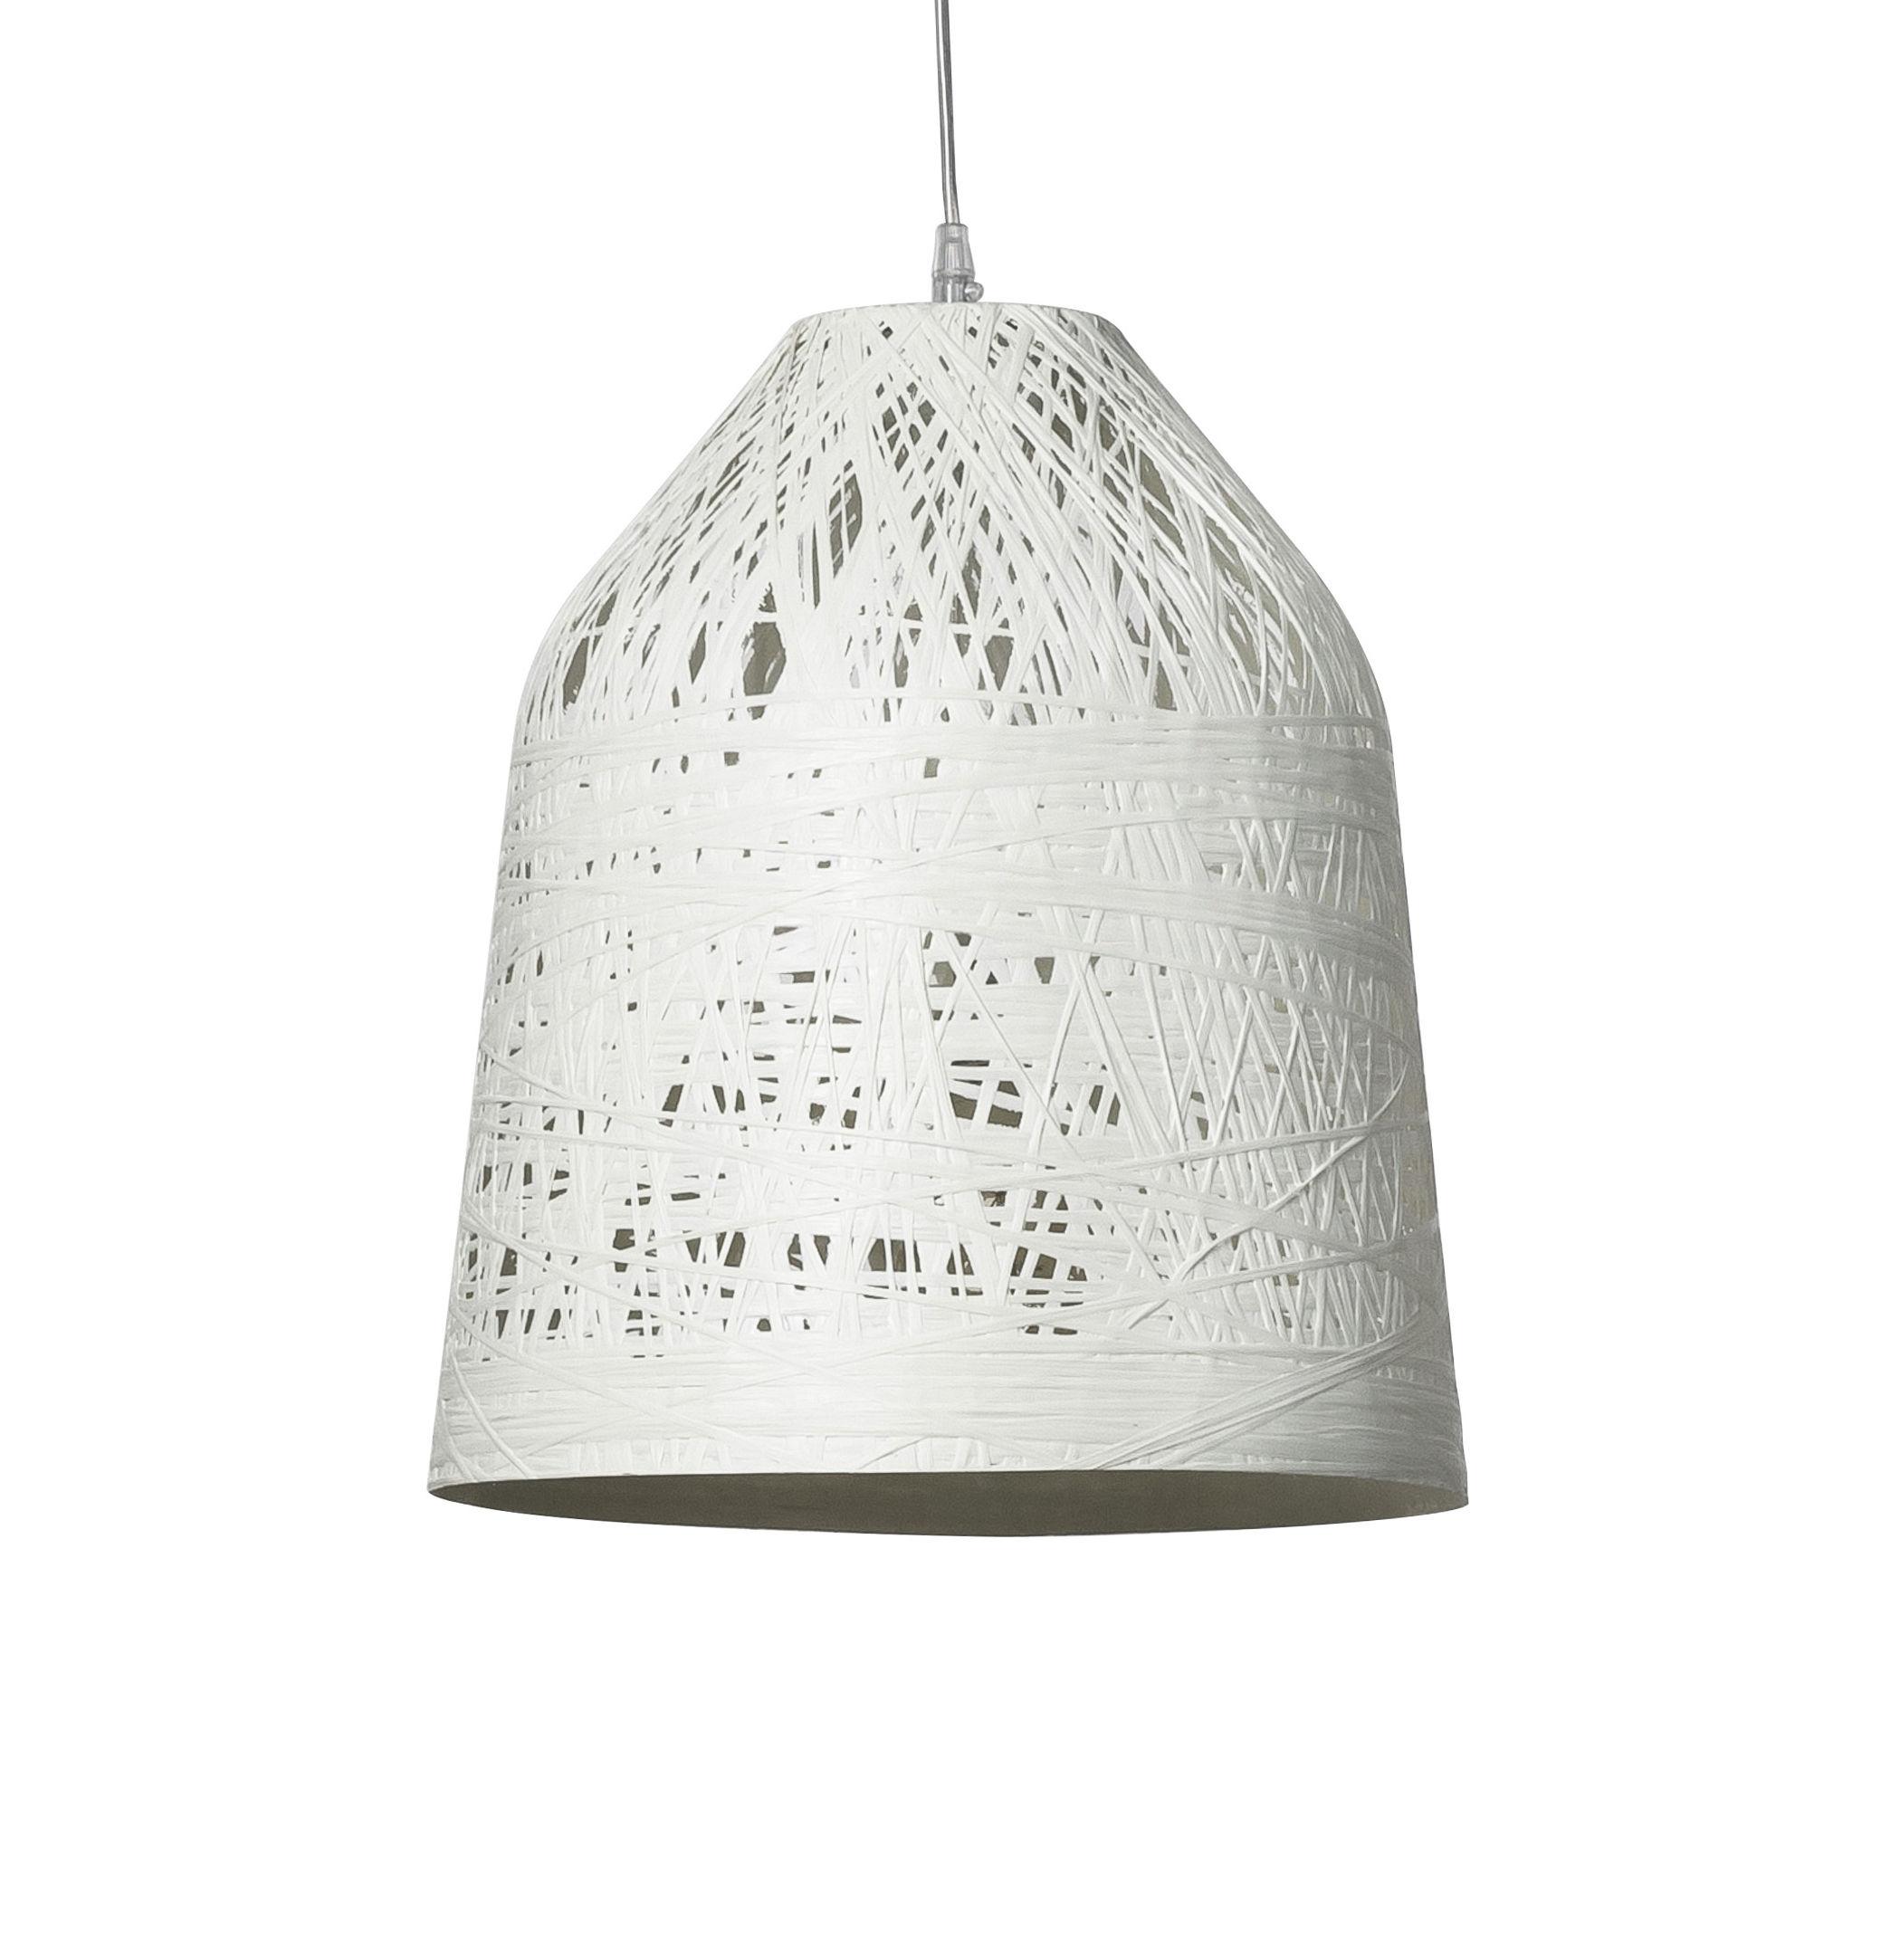 Lighting - Pendant Lighting - Black out Pendant - Outdoor - H 40 x Ø 35 cm by Karman - White - Fibreglass